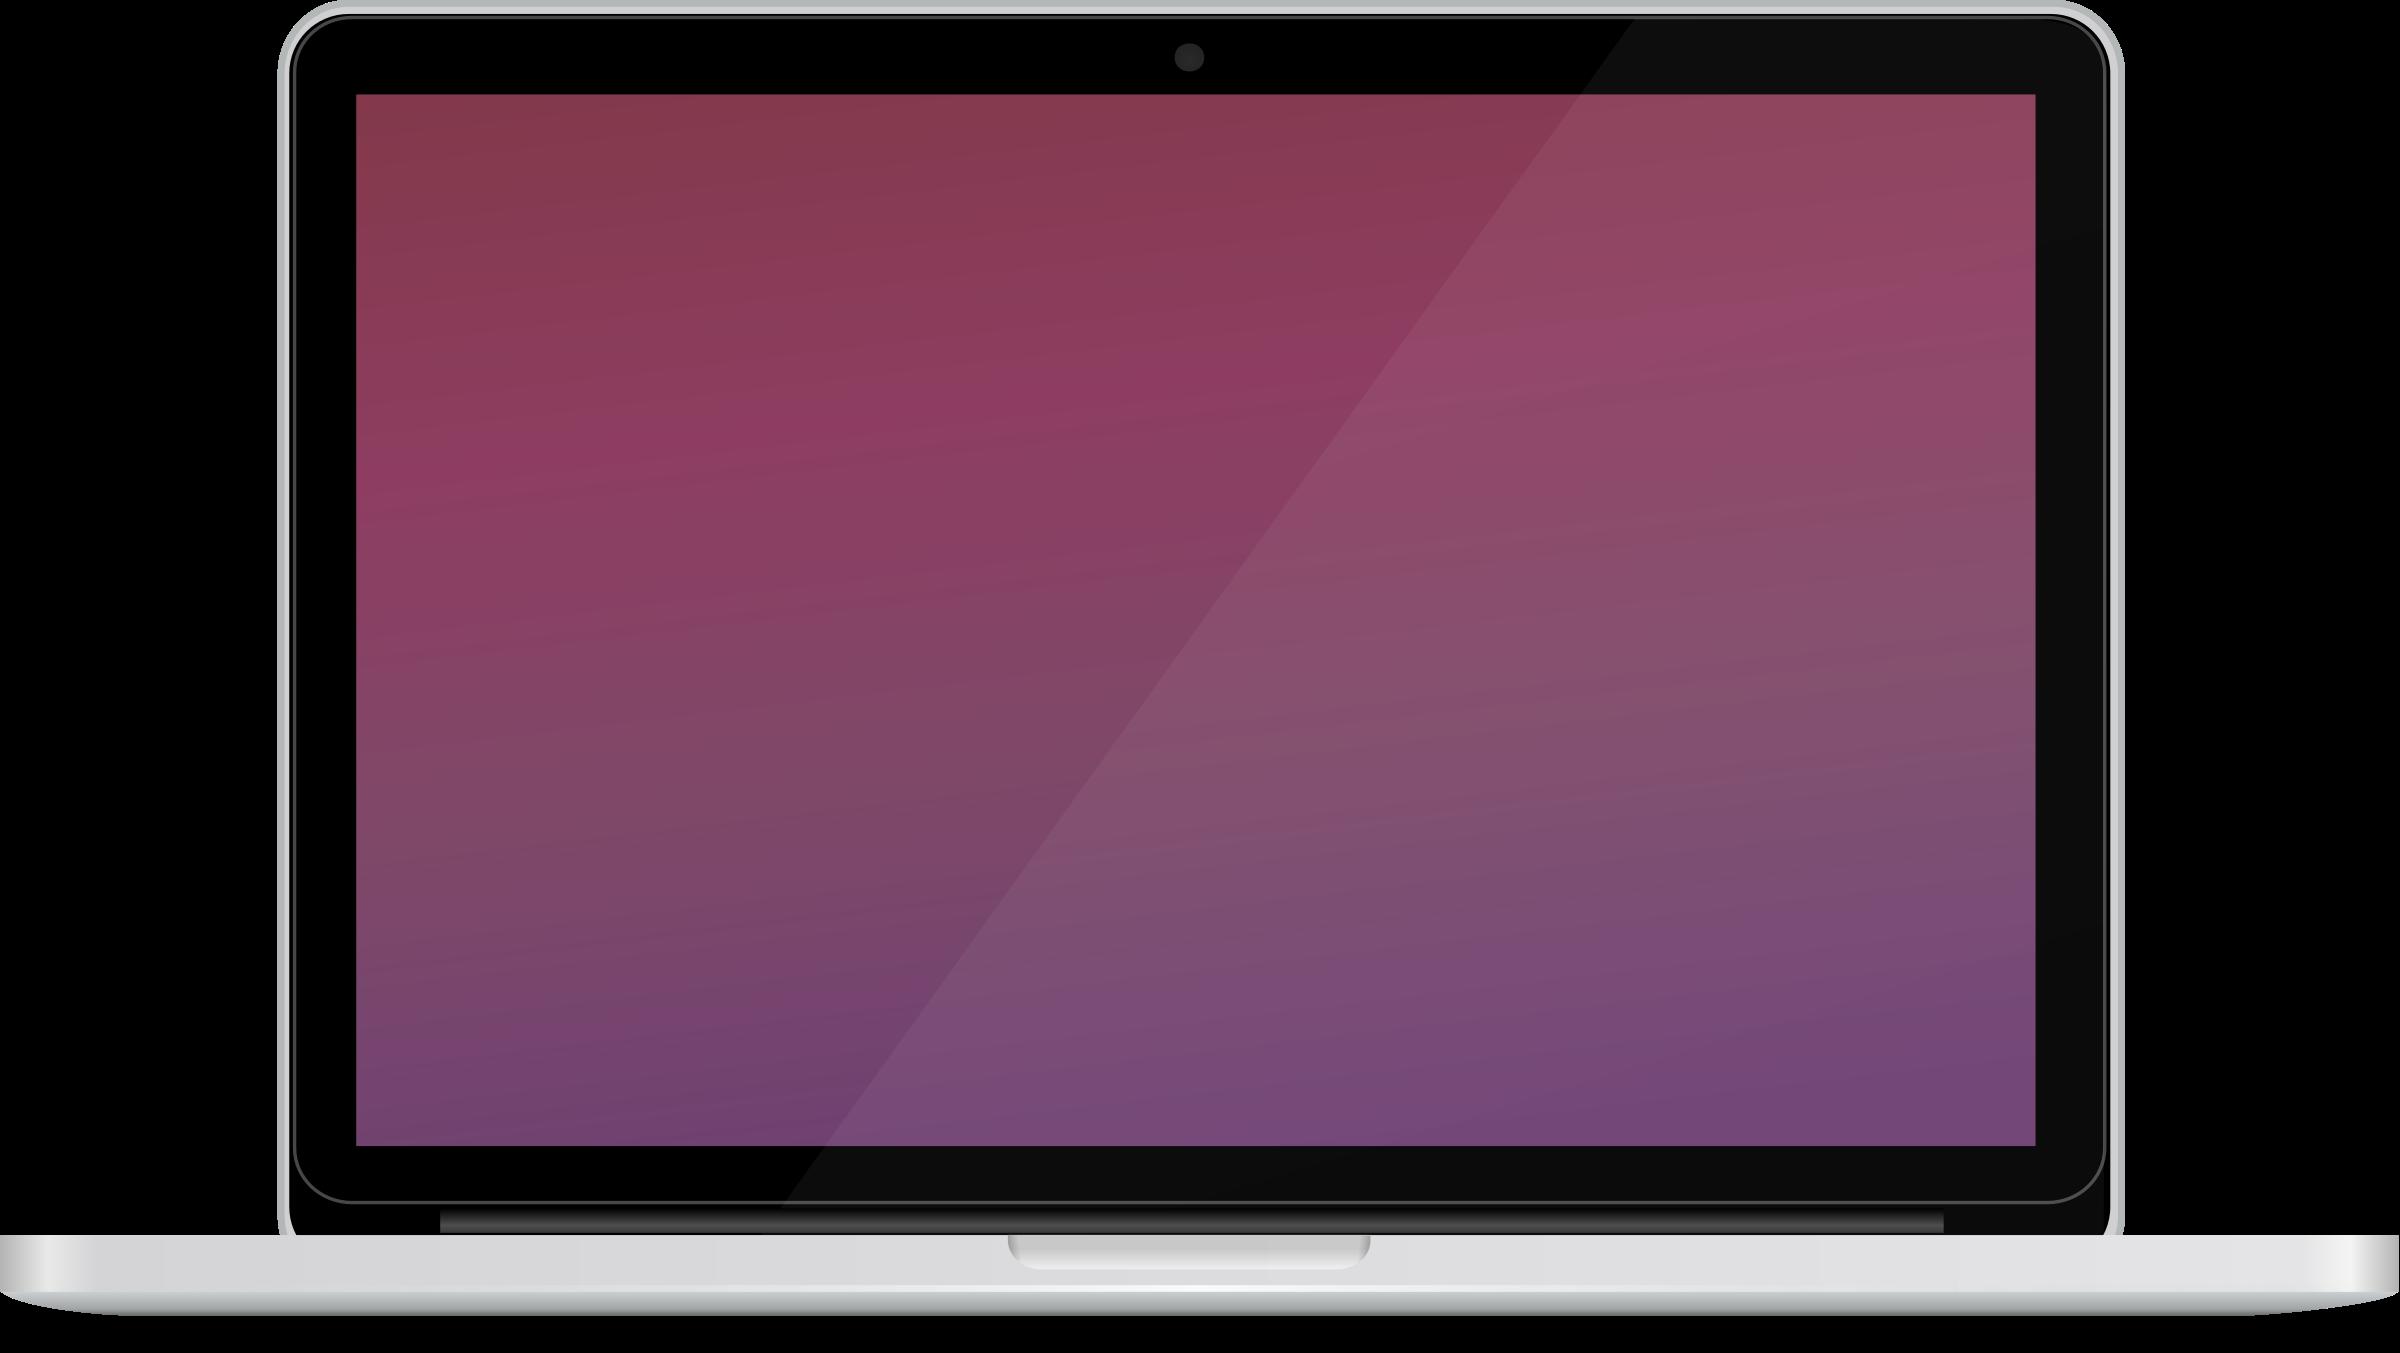 Macbook clipart apple laptop MoonBook Laptop Laptop MoonBook Clipart